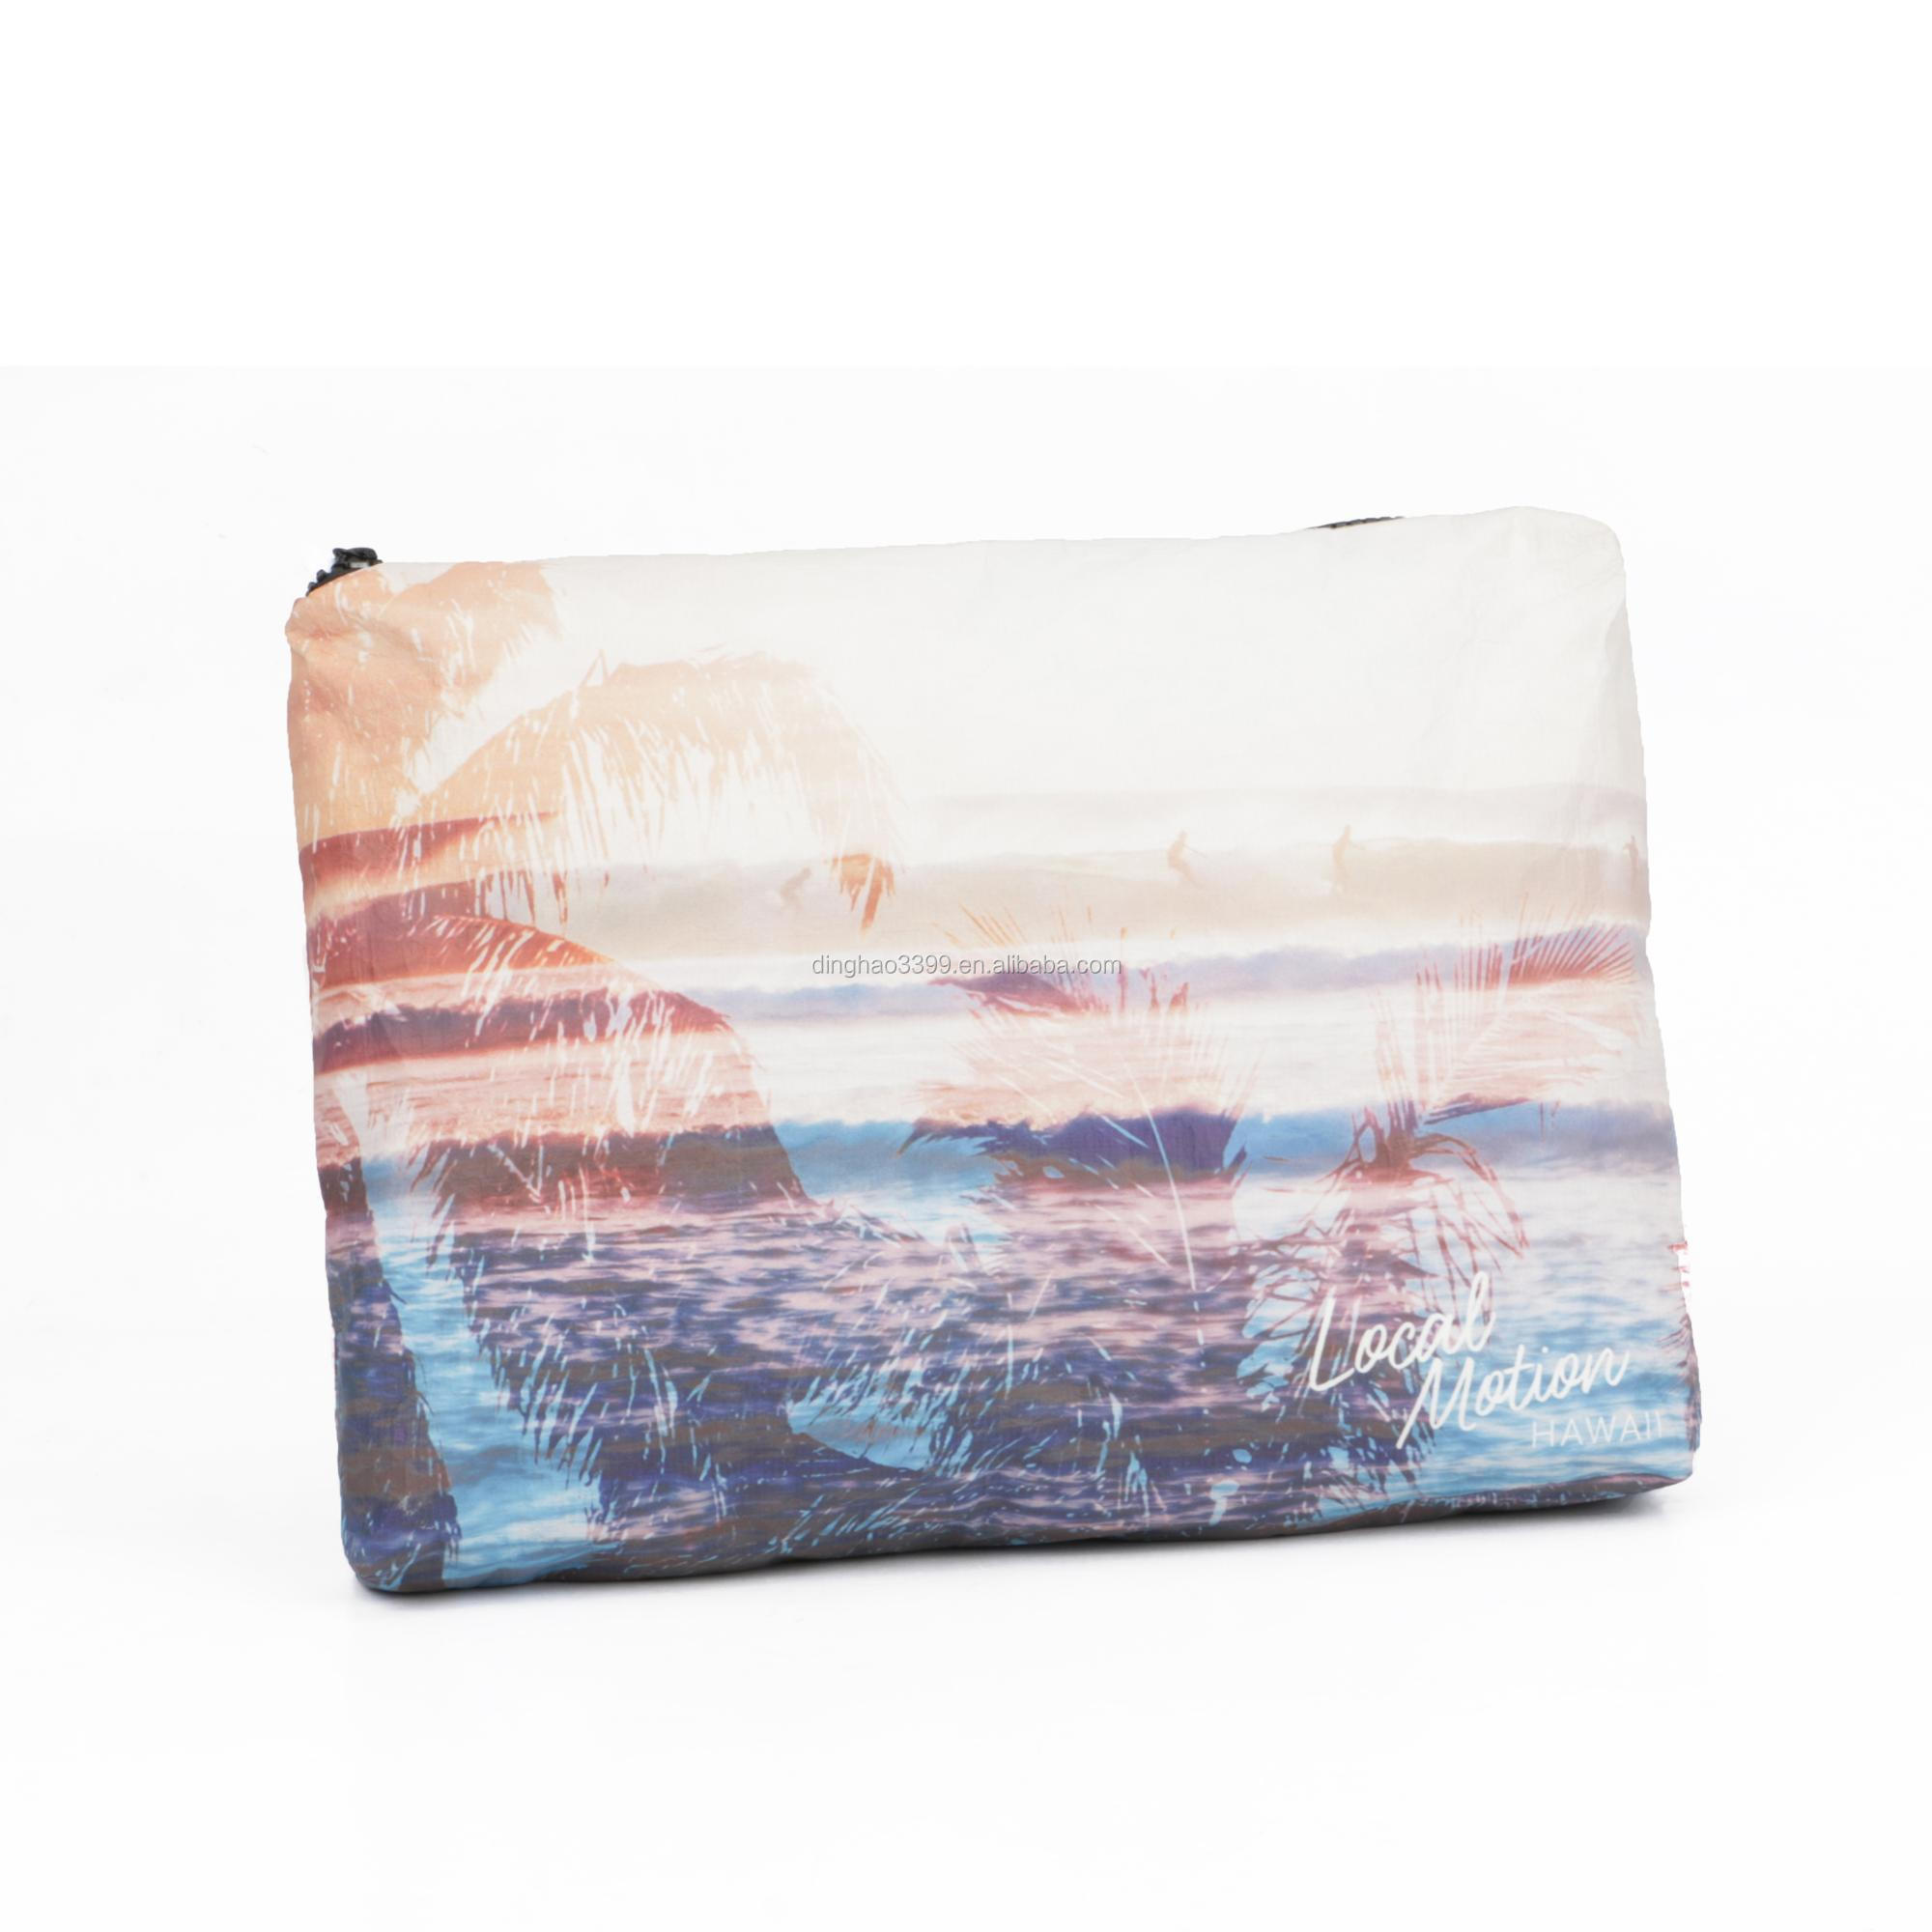 5e2bede8cd71 China supplier coated tyvek cosmetic pouch custom printed PU coated tyvek  paper makeup bag waterproof lightweight soft tyvek bag